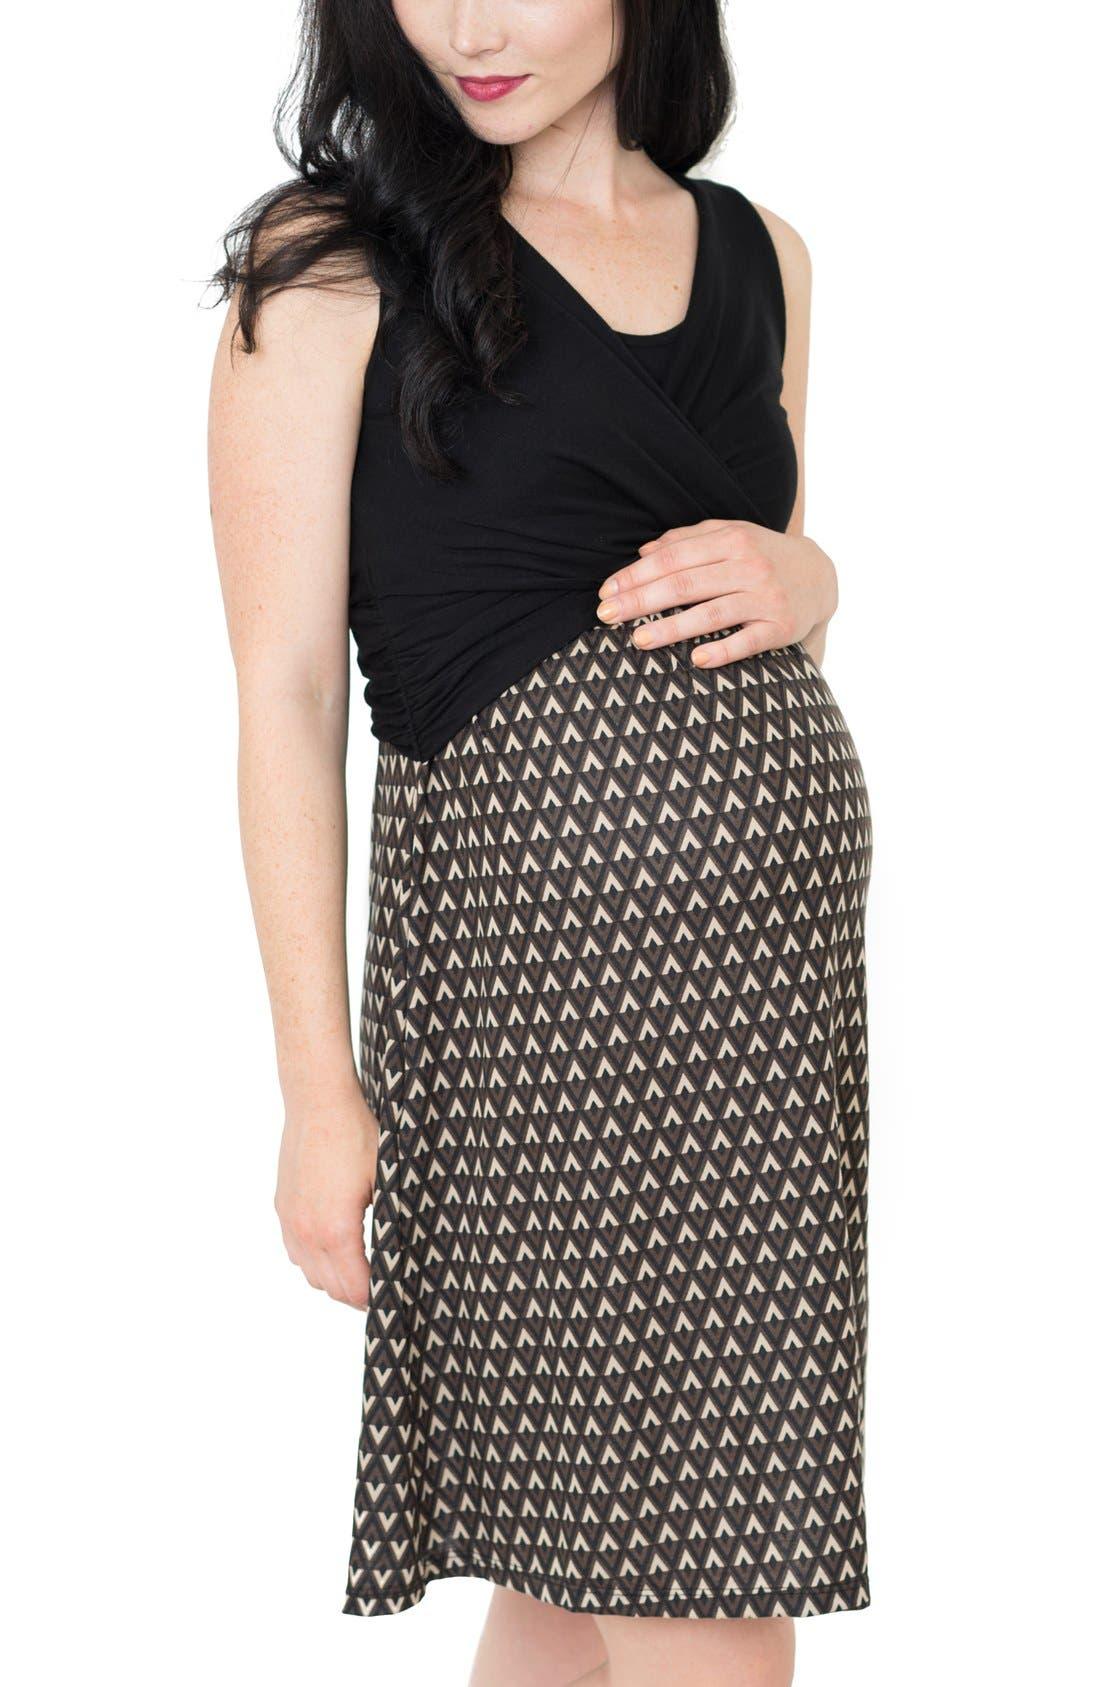 NOM MATERNITY 'Lela' Nursing Maternity Dress